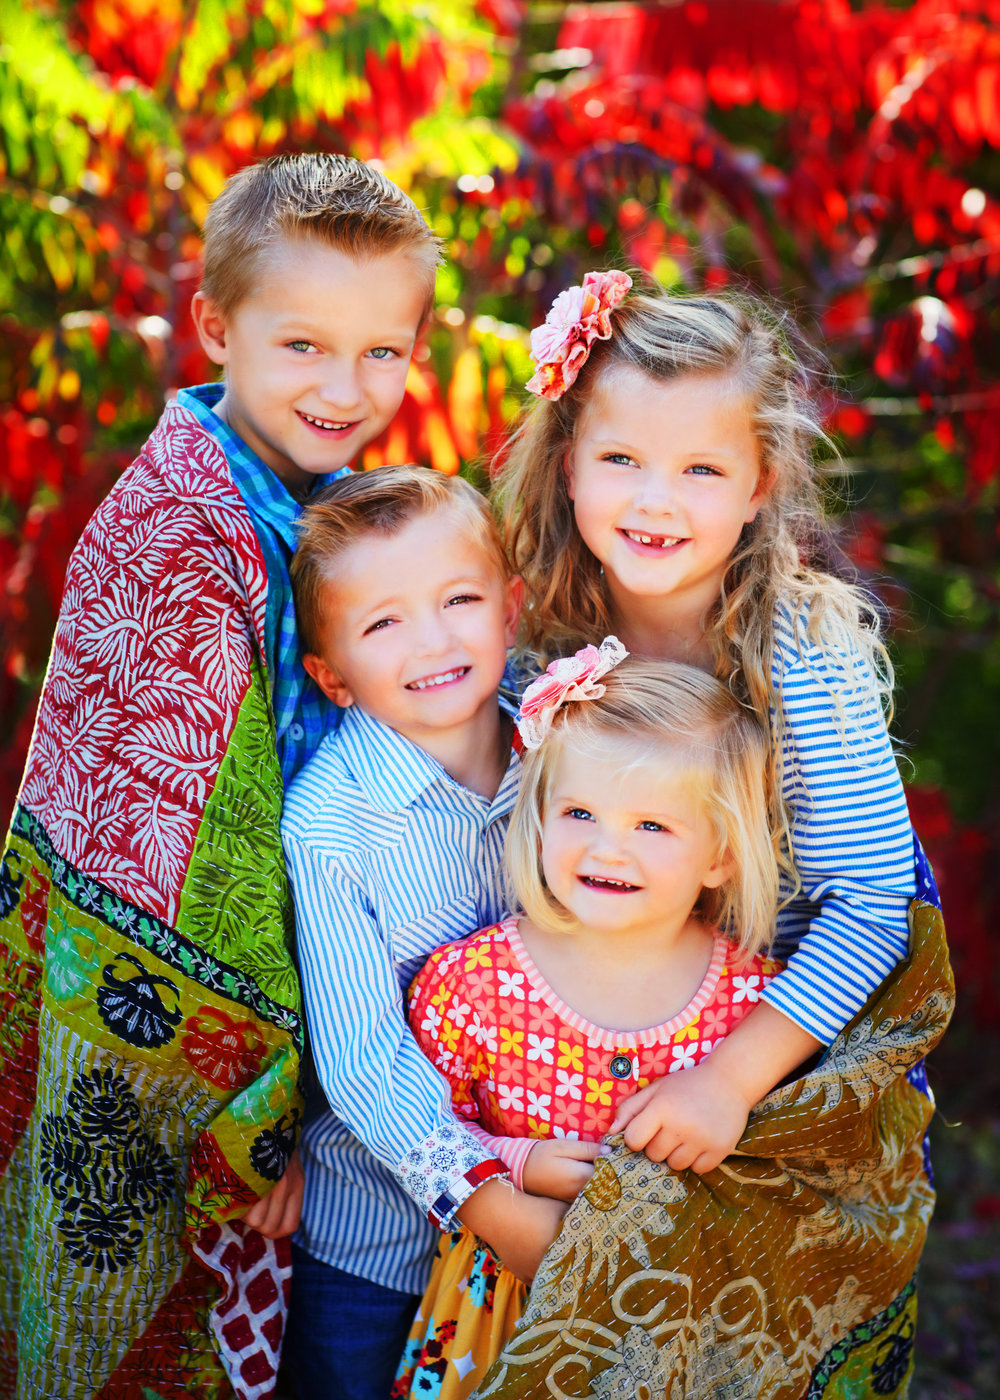 richlin family 15 007 1.jpg